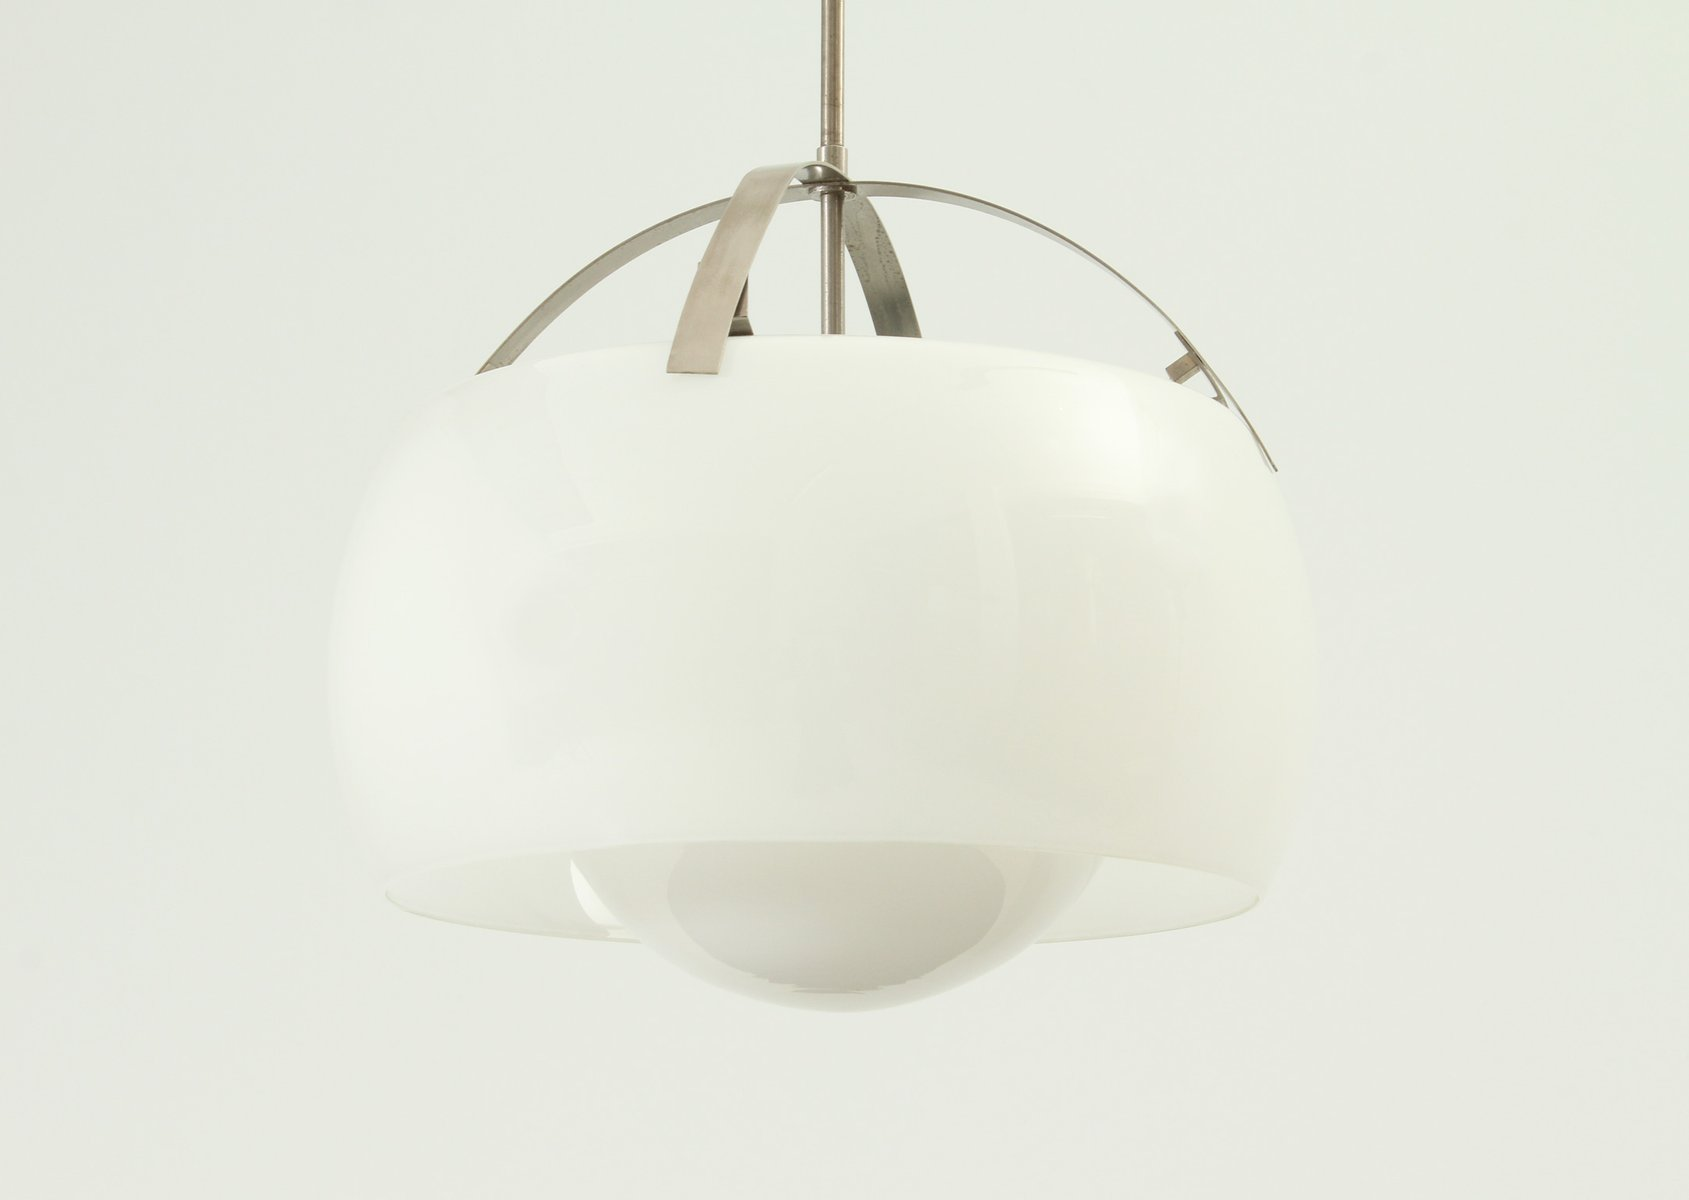 Omega Deckenlampe von Vico Magistretti für Artemide, 1961